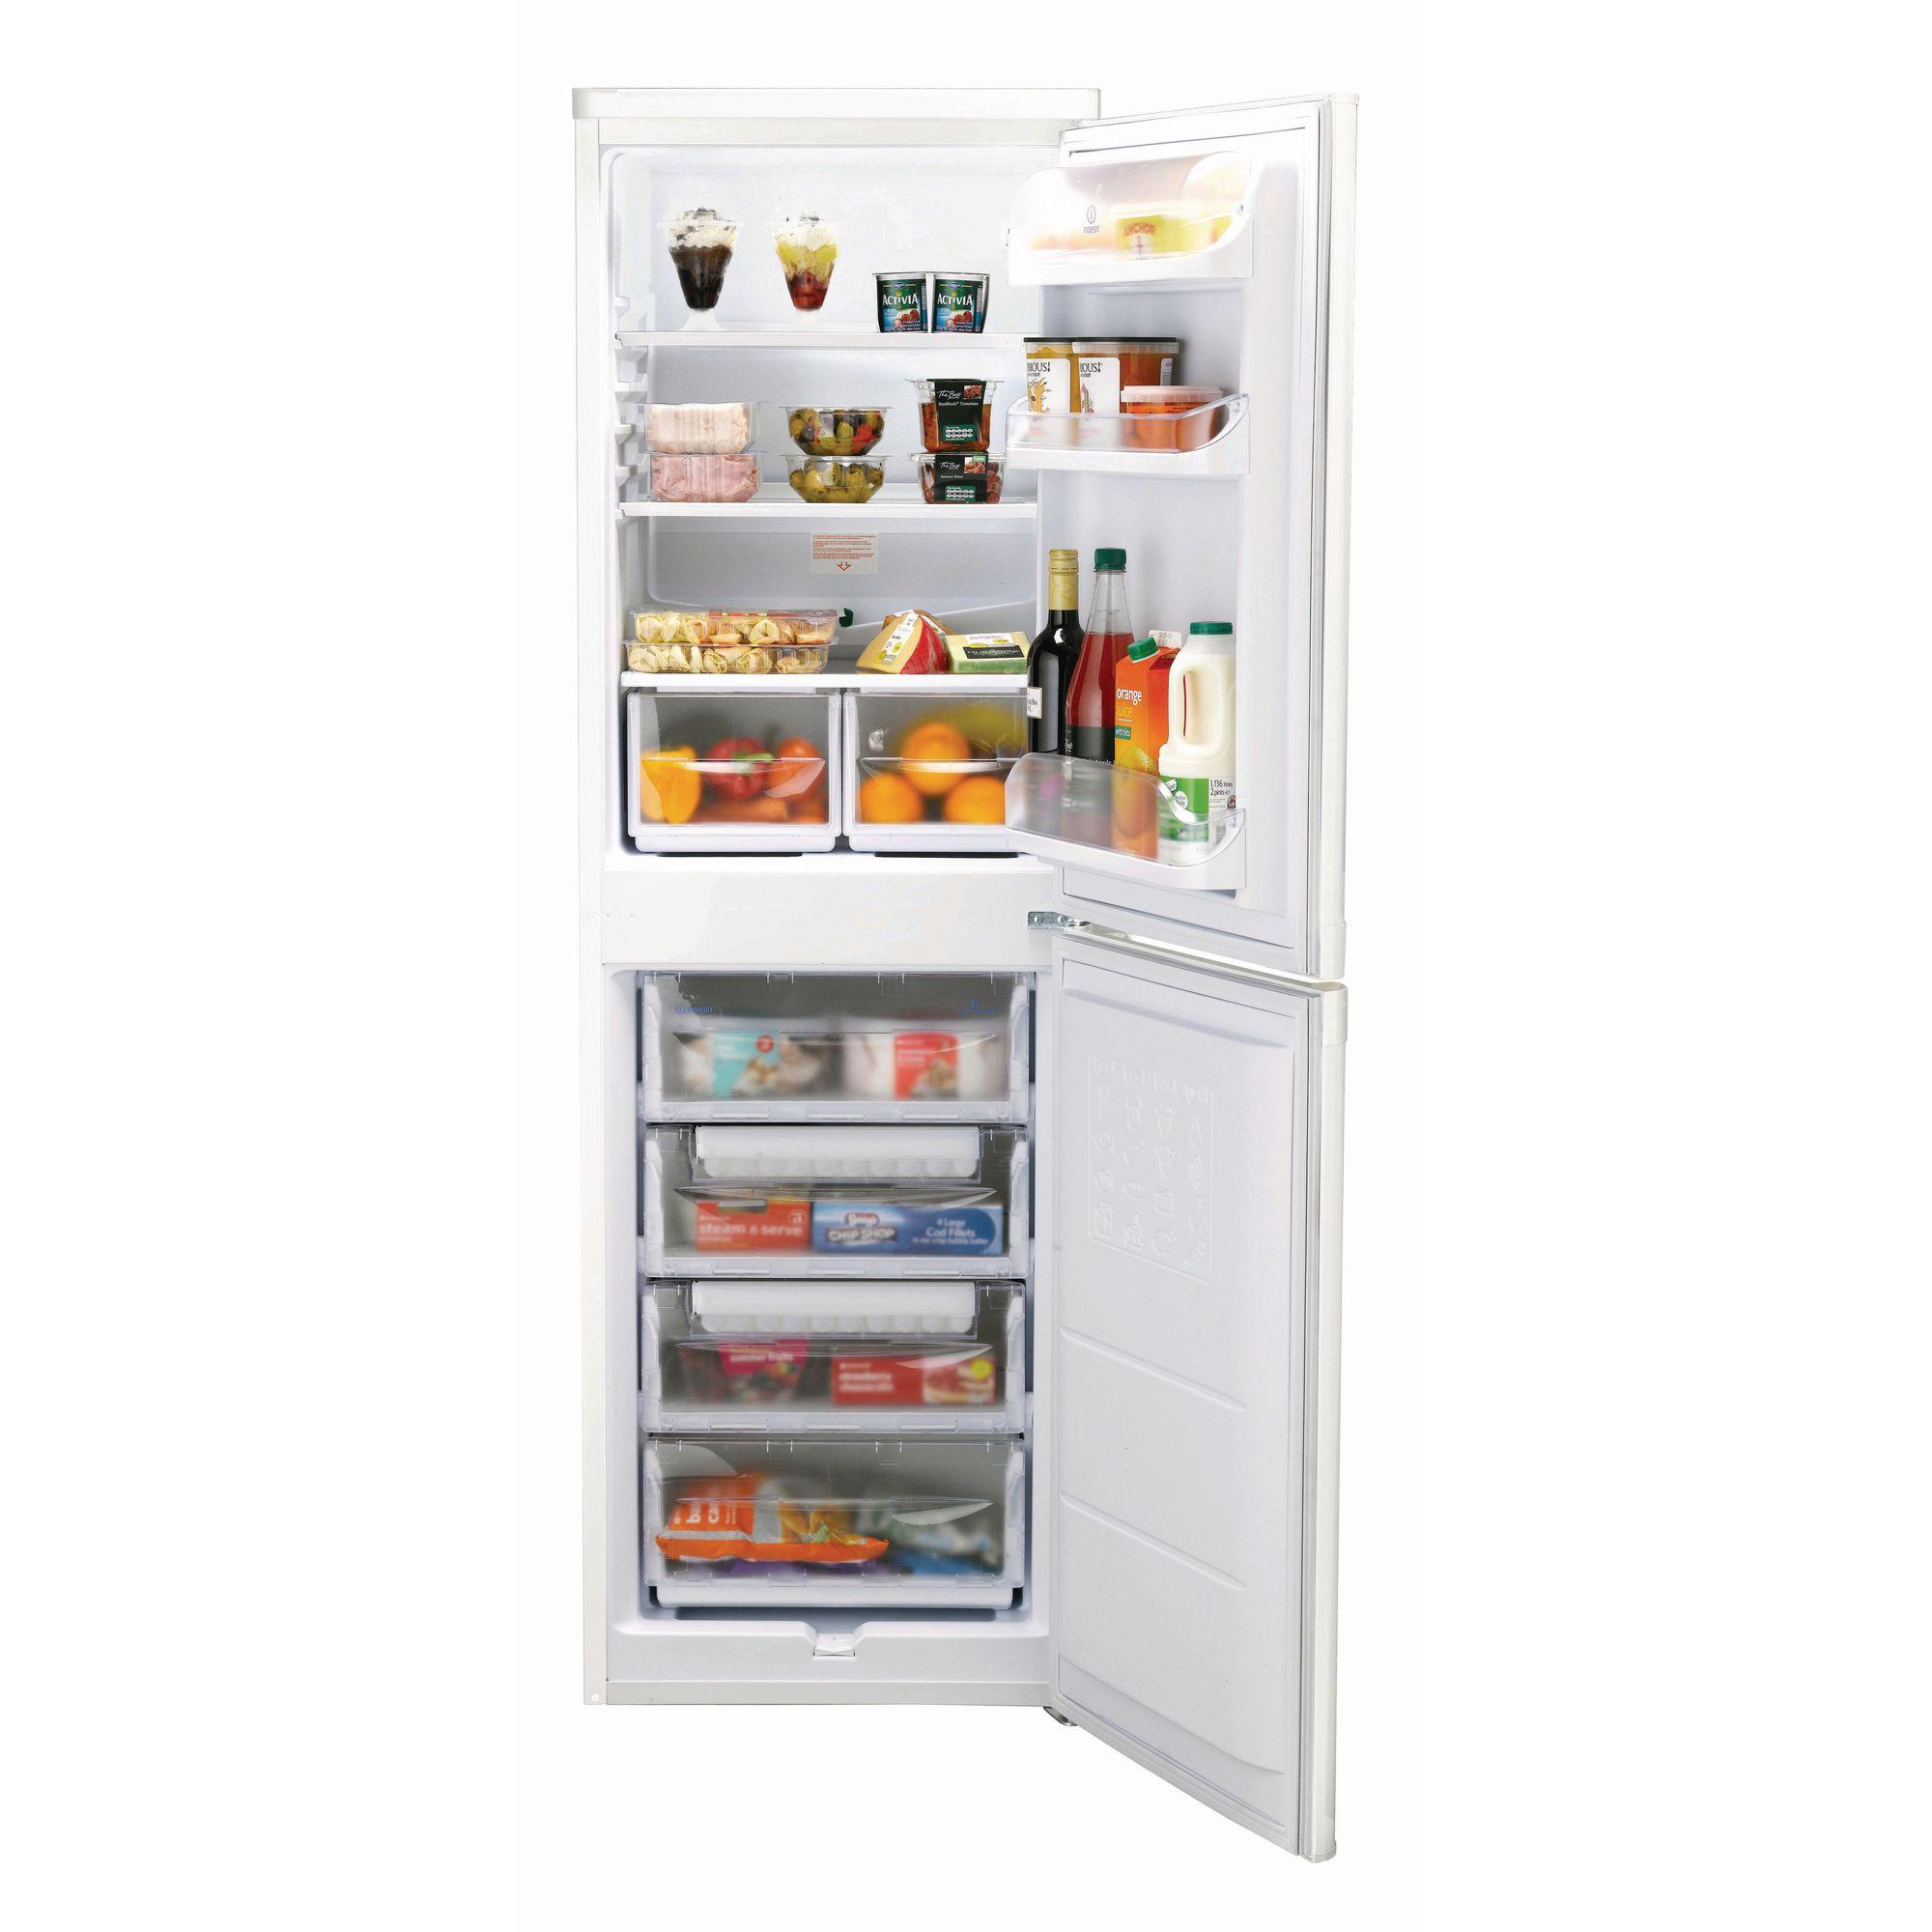 HC1583077 - Indesit Fridge Freezer